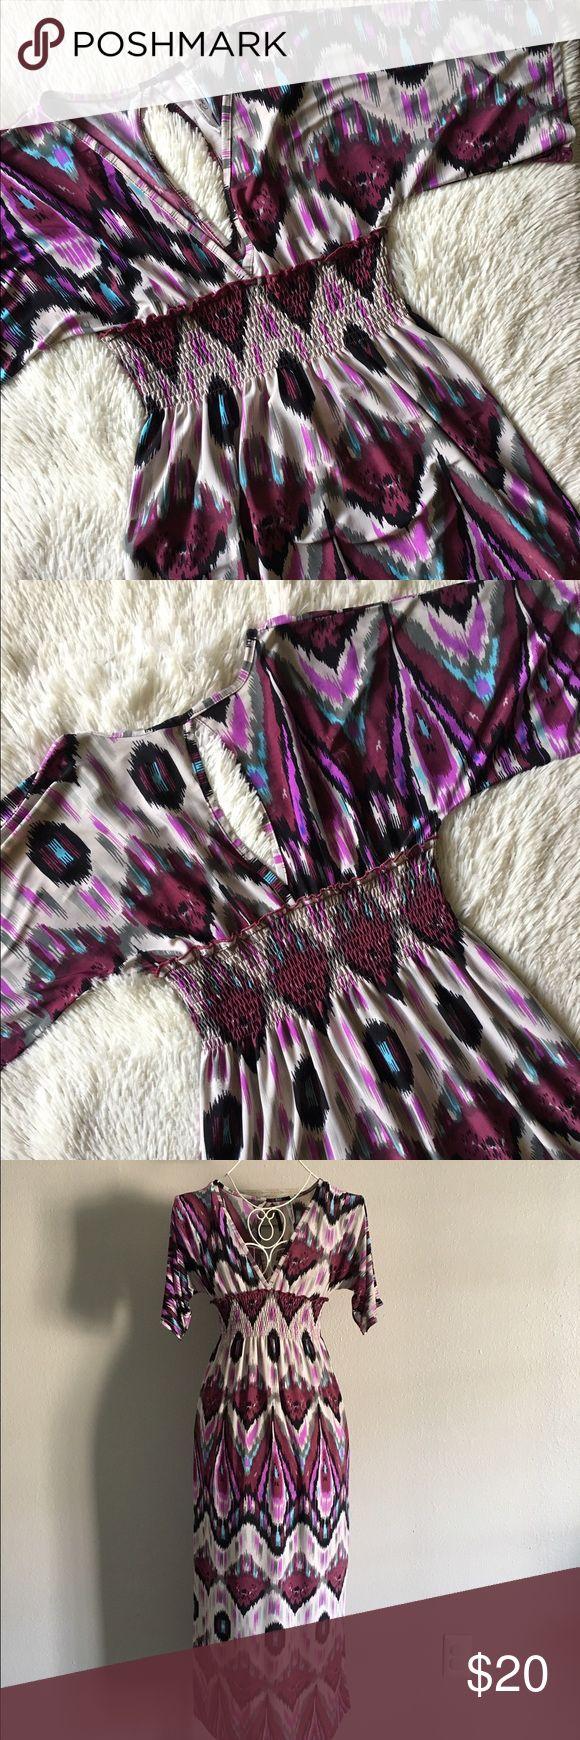 Christina Love Aztec print maxi dress. Excellent condition. Christina Love Aztec Print maxi dress. Size Sm. 95% polyester,5% spandex. Armpit to armpit approximately 15 inches and approximately 49 inches long. Very flattering! Christina Love Dresses Maxi